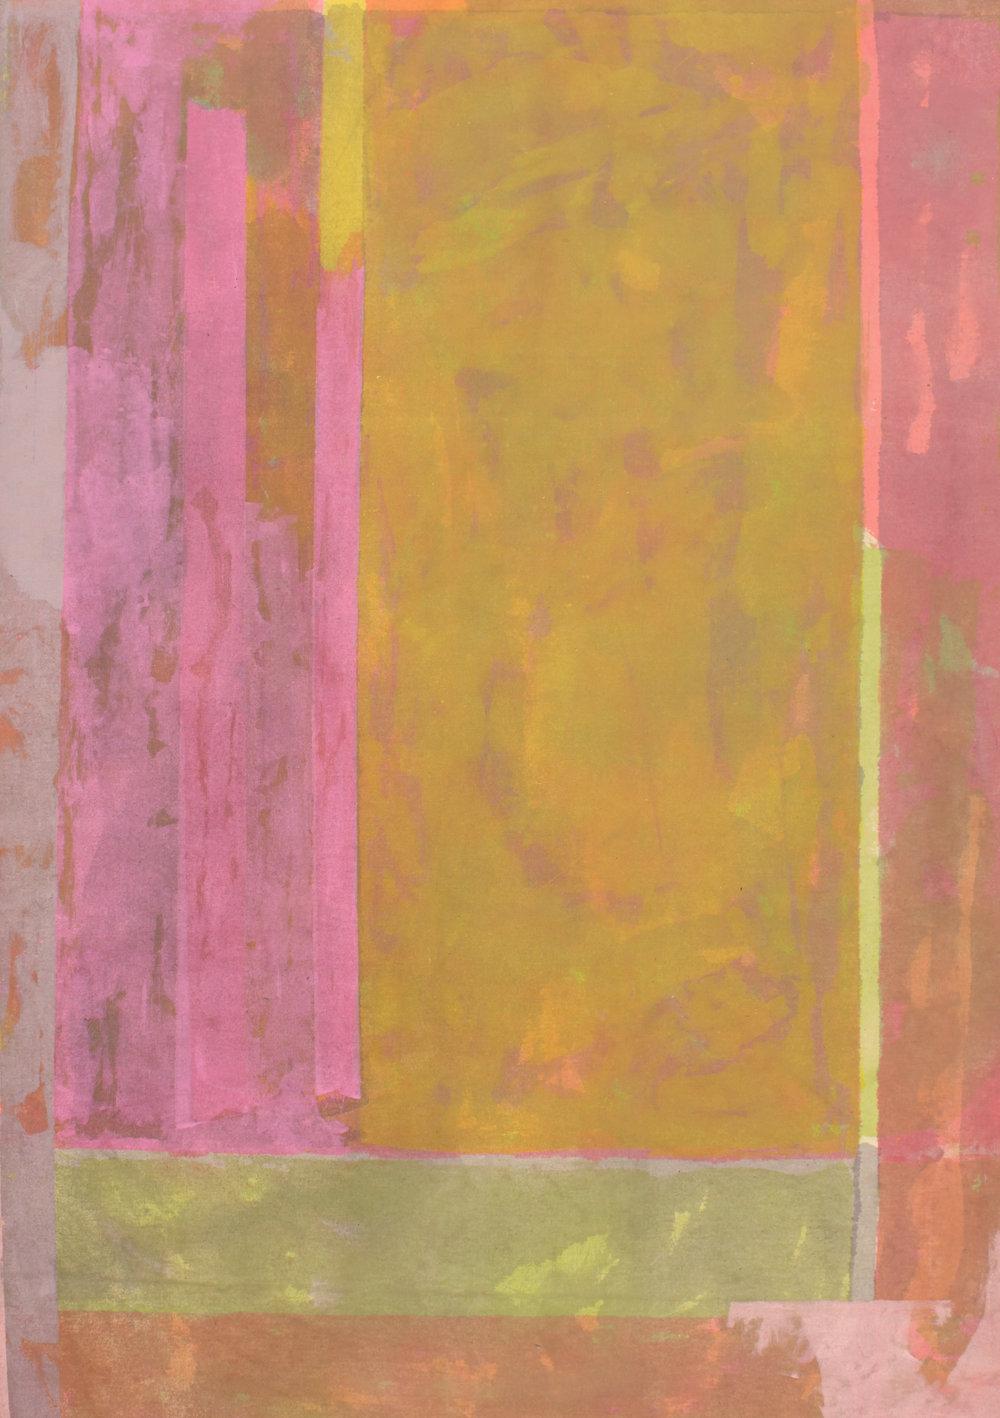 1974_UntitledNo7409_acryliconcanvas_67x47_PNF129.jpg